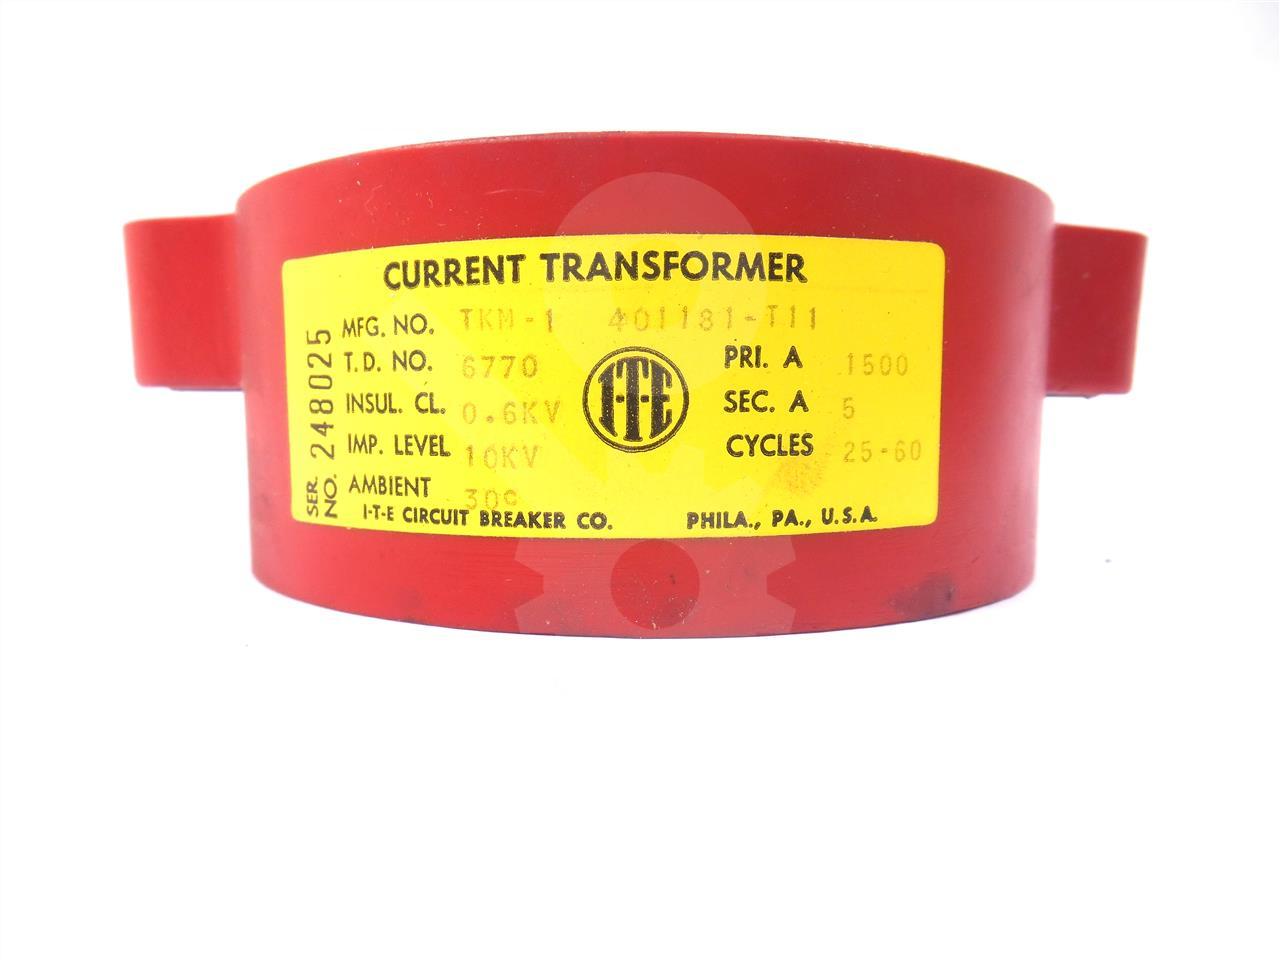 401181-T11 ITE TKM-1 CURRENT TRANSFORMER 1500:5 FOR K-LINE SWITCHGEAR